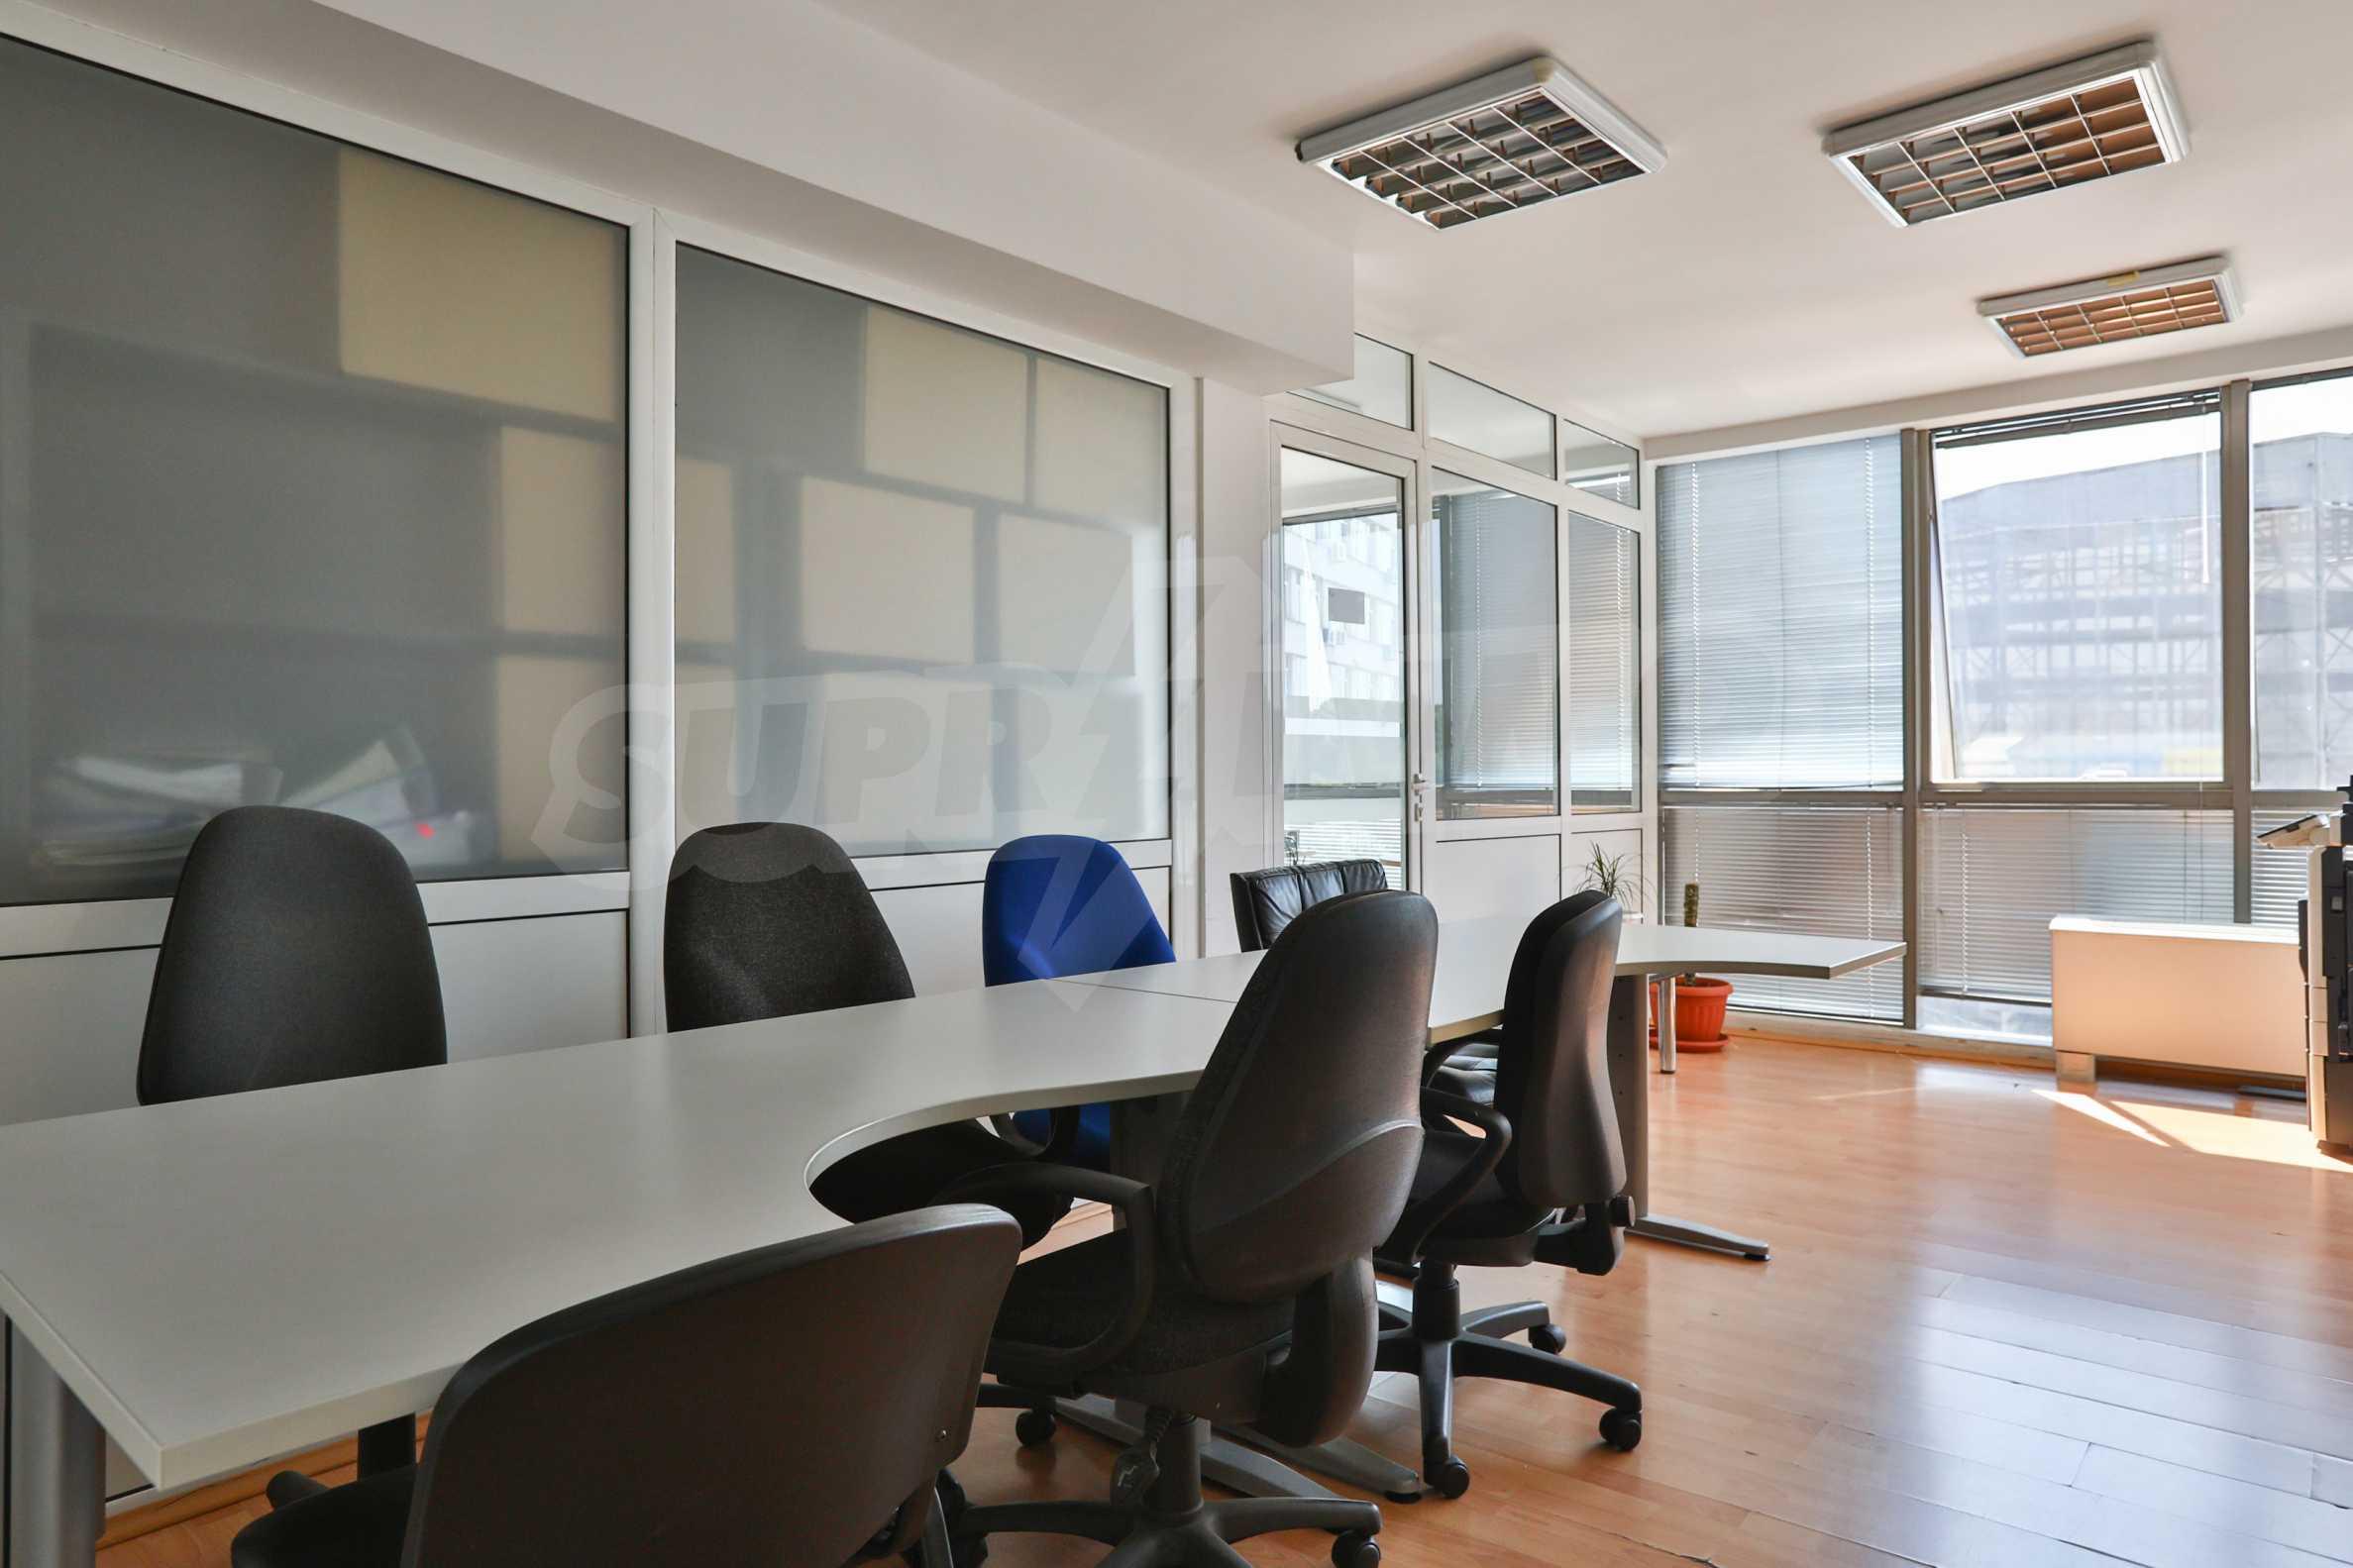 Офис в бизнес сграда висок клас на бул. Цариградско шосе 32